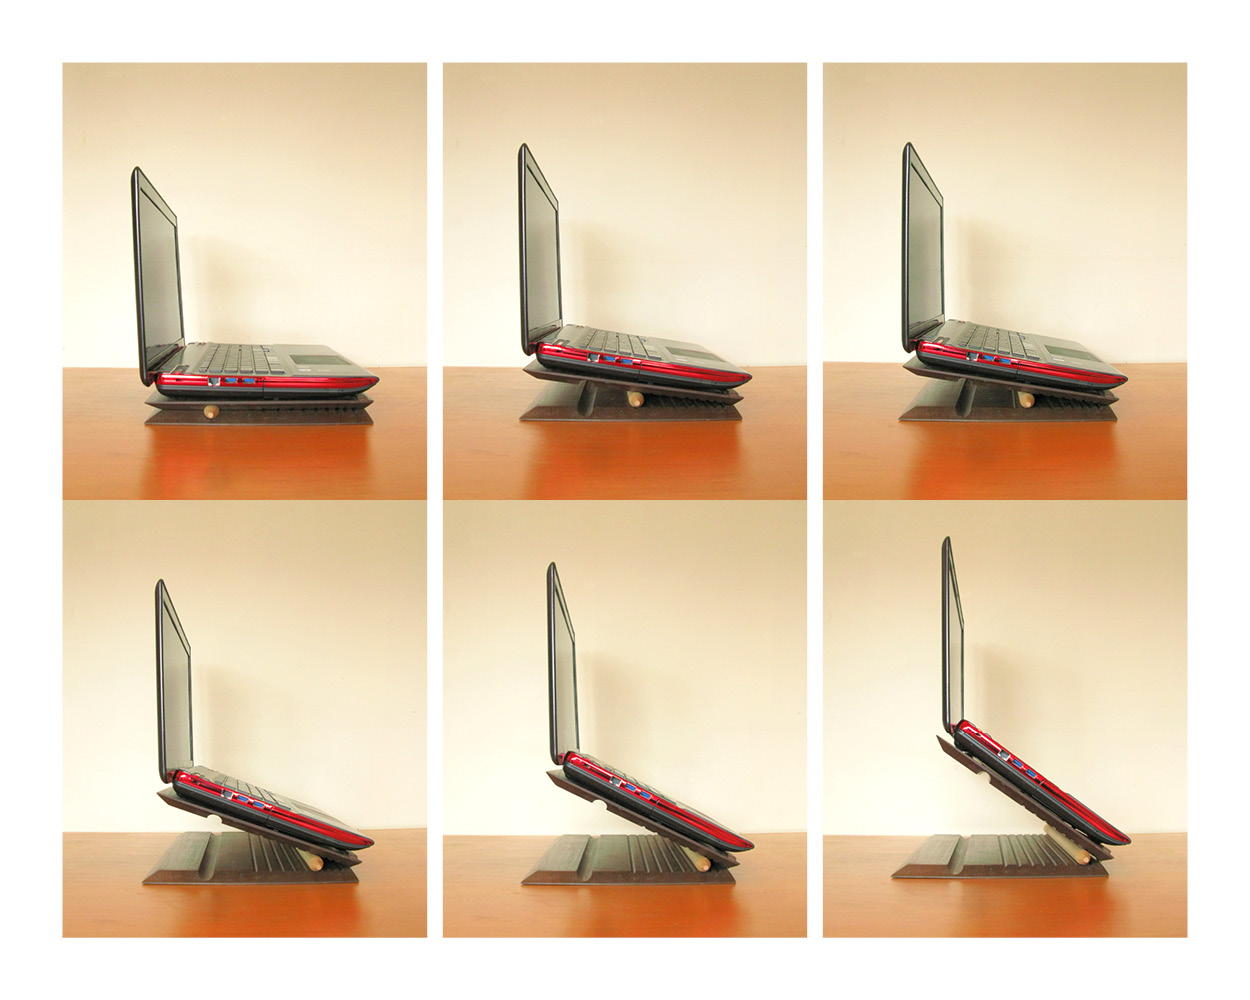 AdAR - Adjustable Laptop Riser